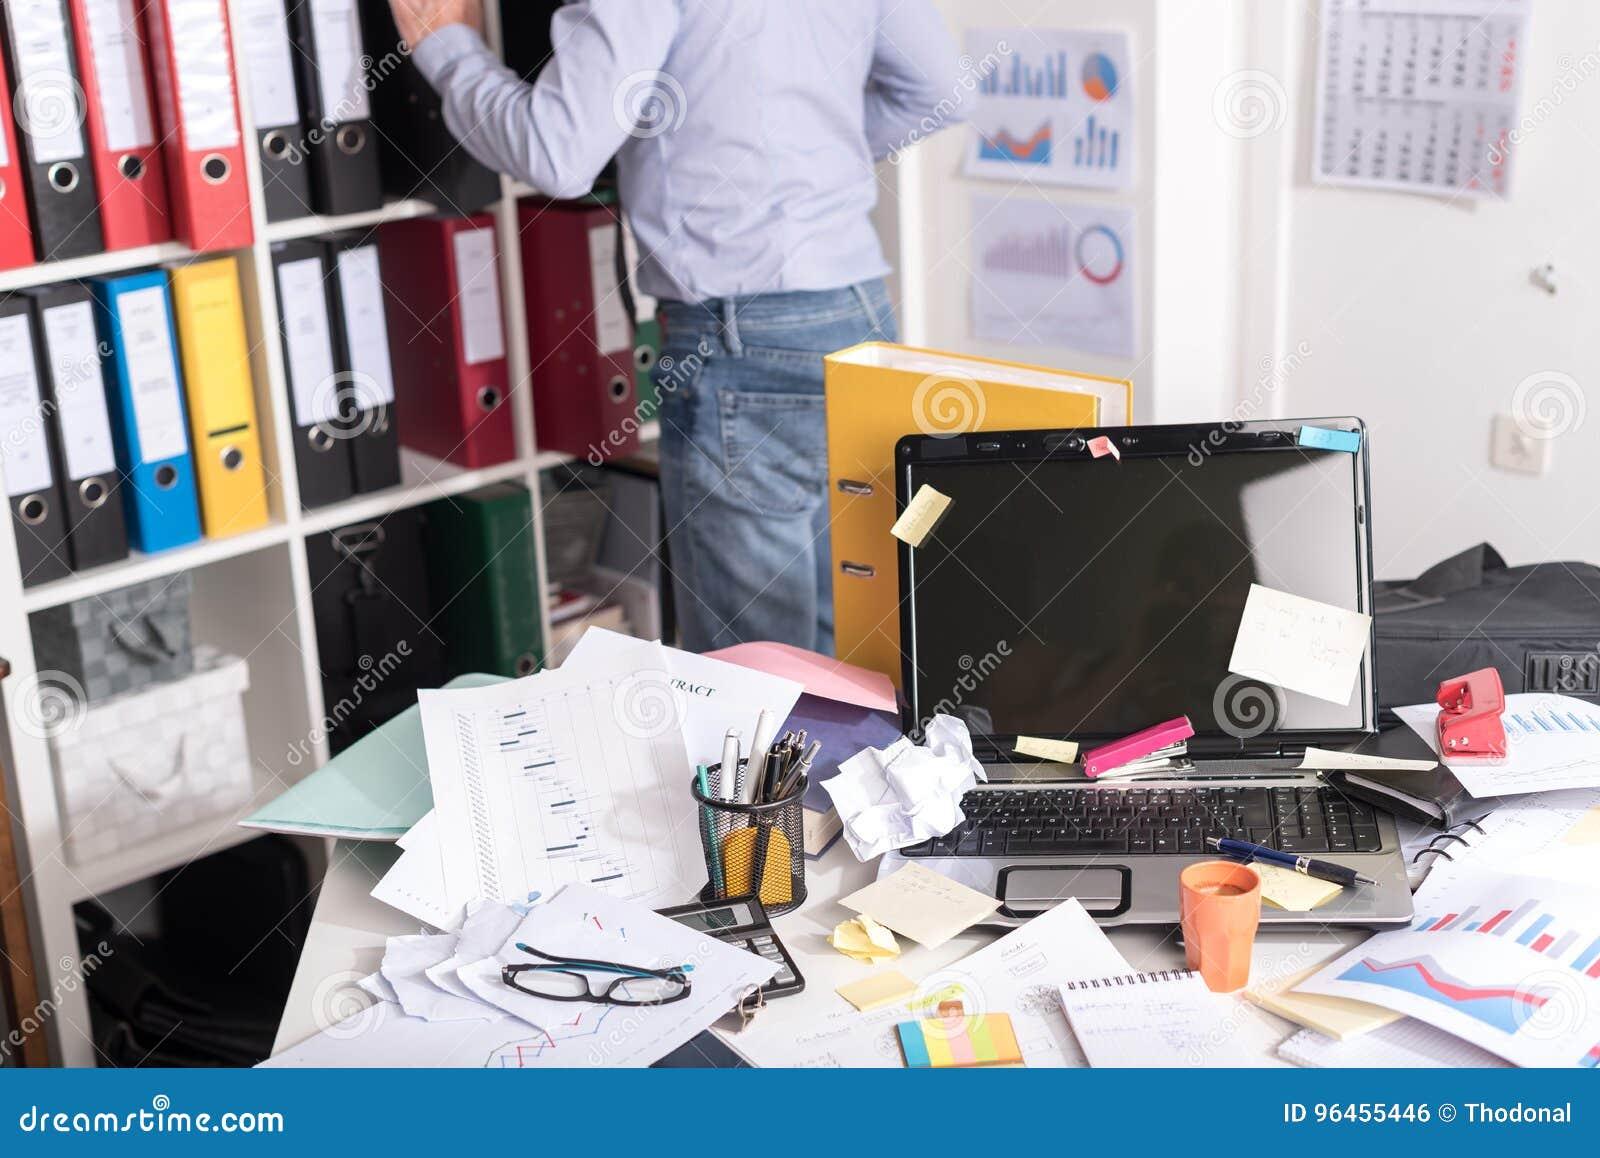 Upaćkany i cluttered biurko